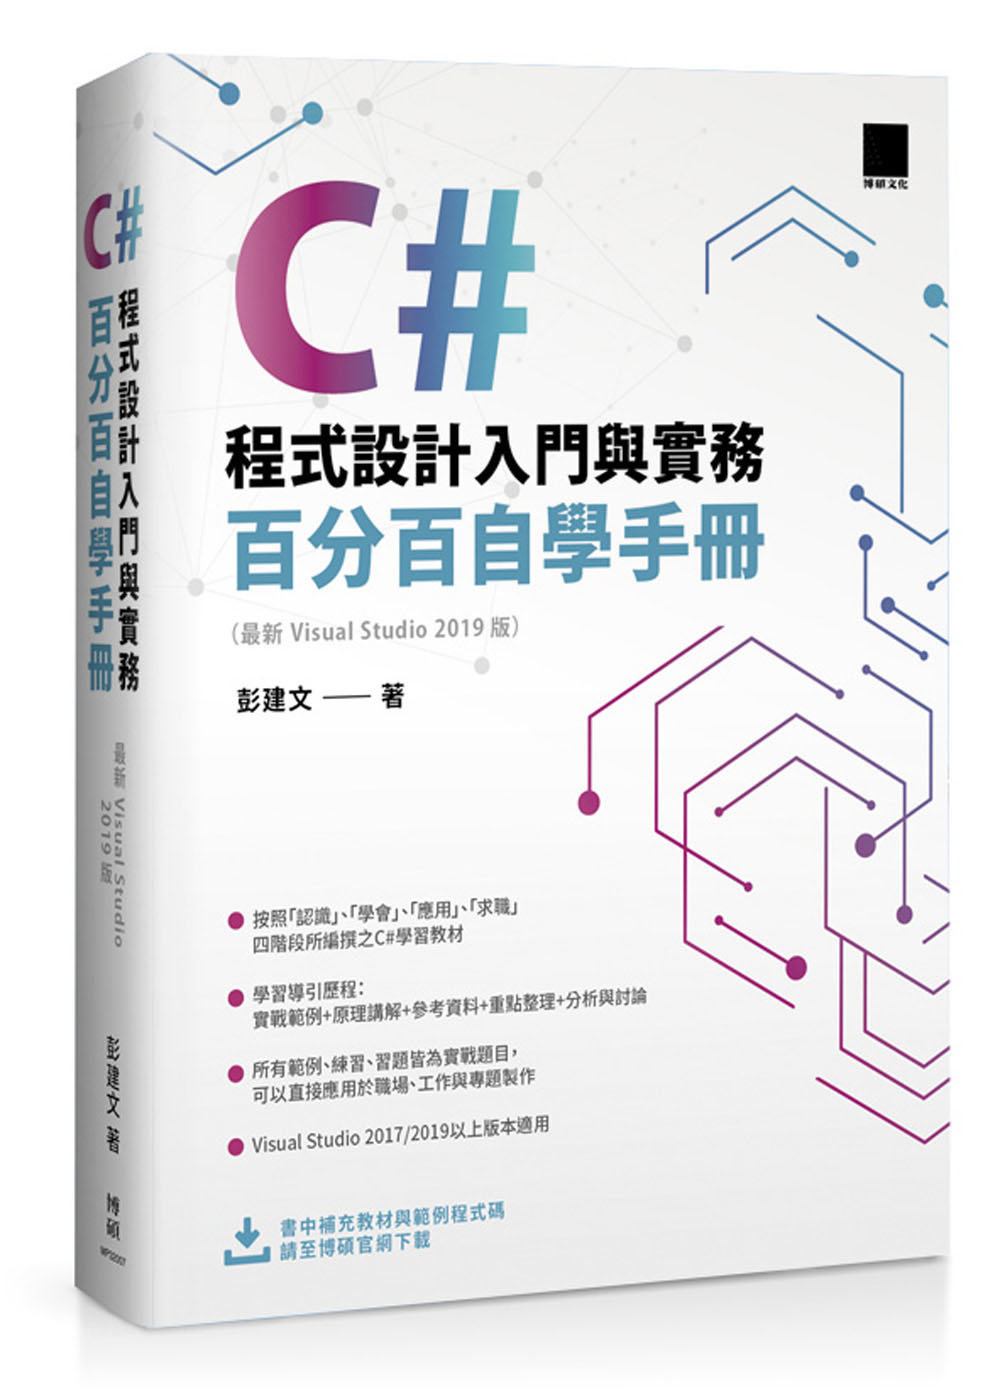 C# 程式設計入門與實務:百分百自學手冊 (最新 Visual Studio 2019 版)-preview-1